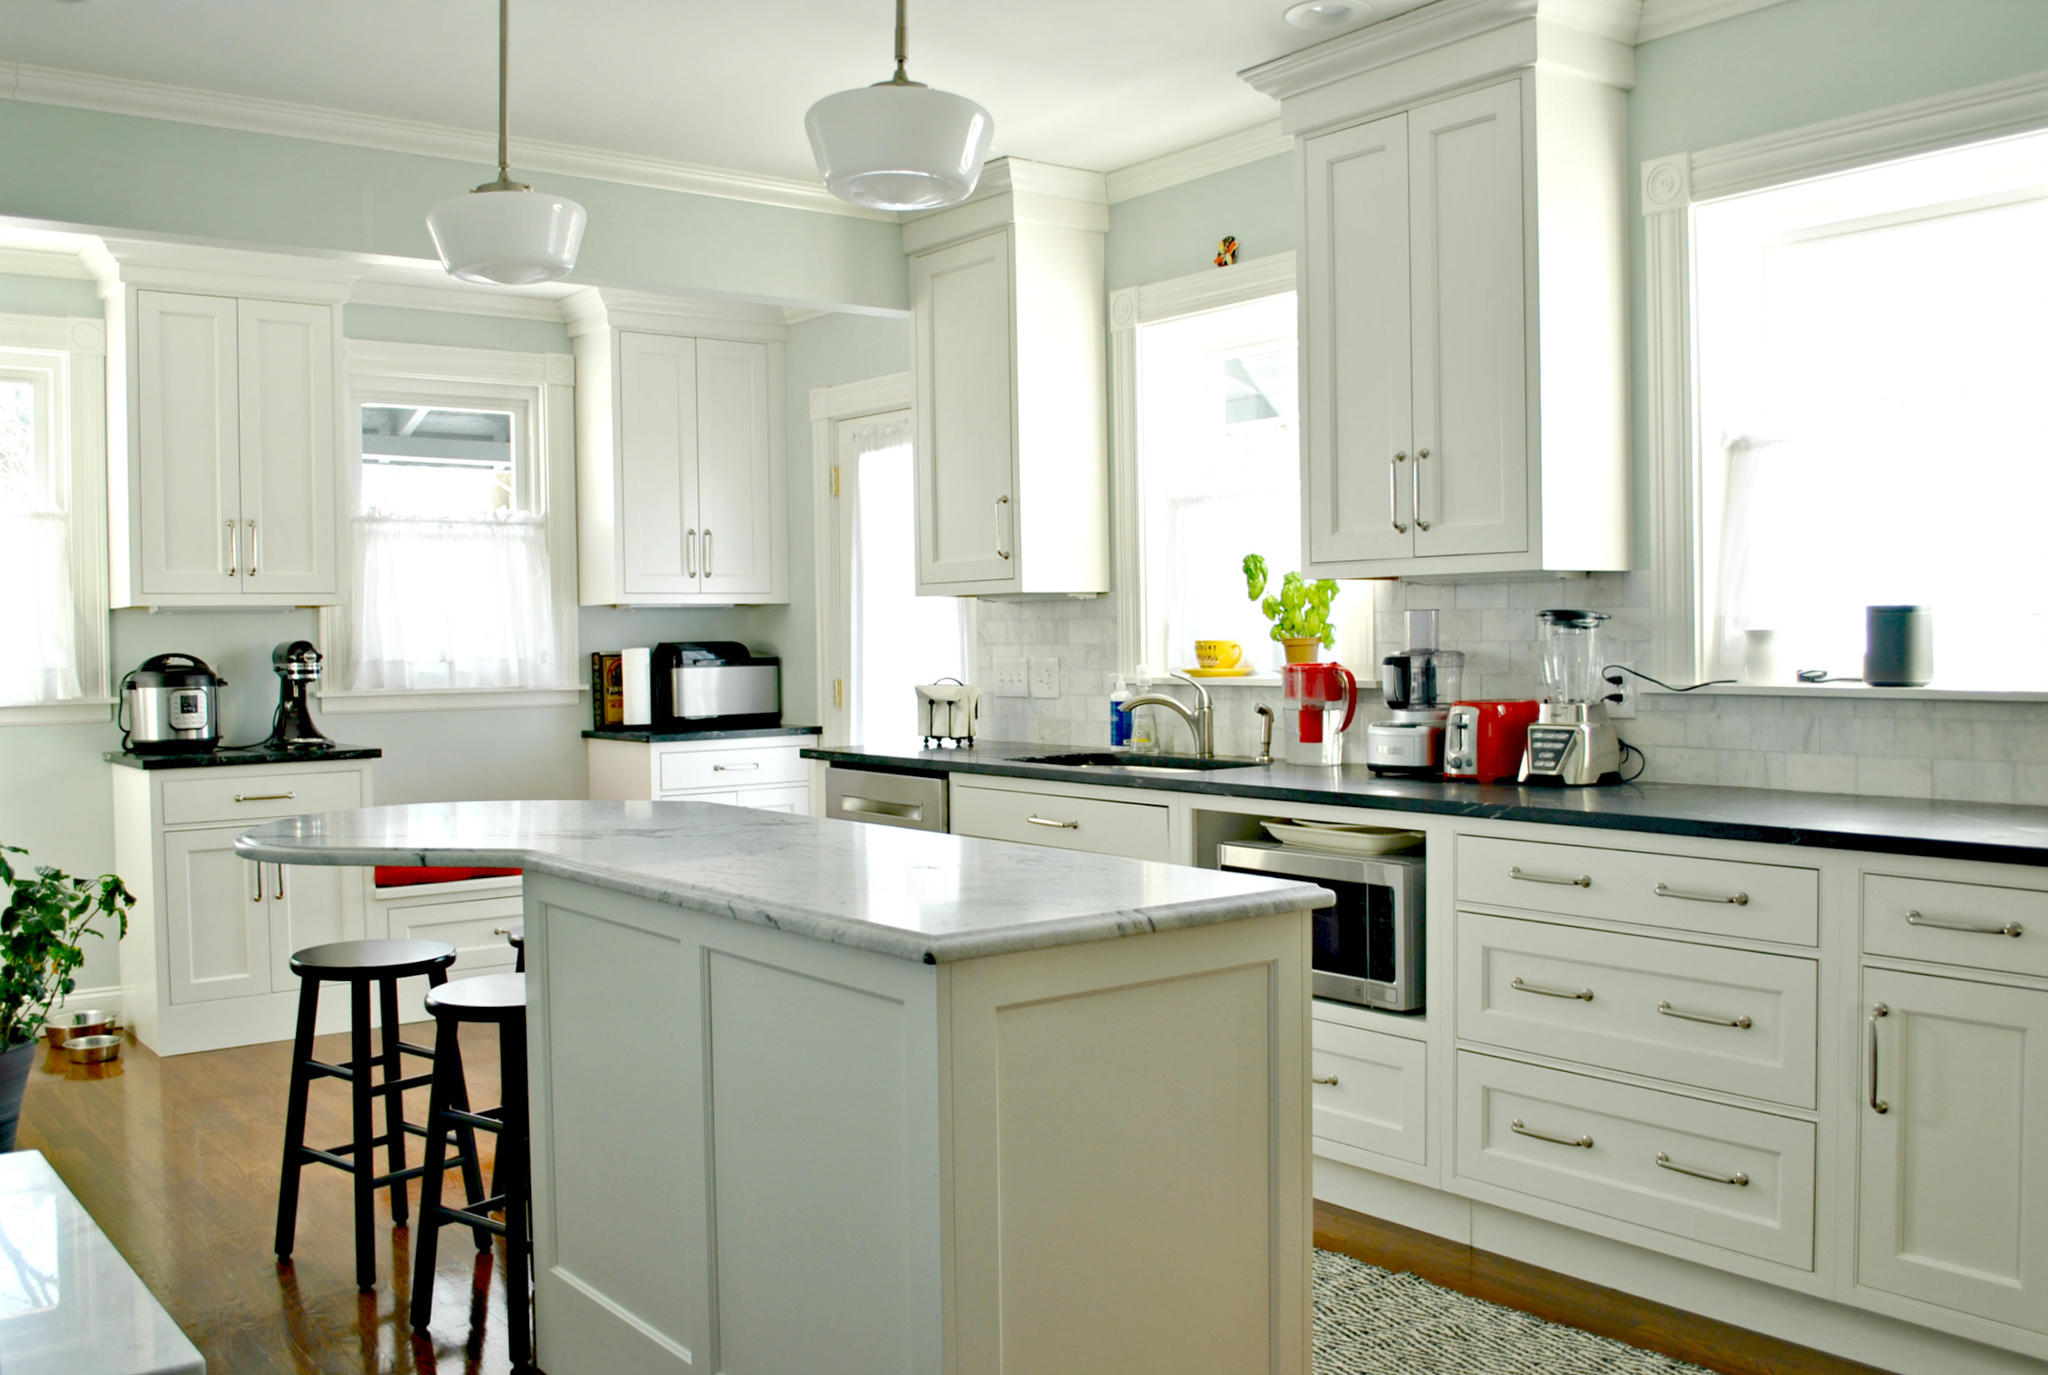 Vintage Victorian Kitchen Remodel In Dorchester, MA